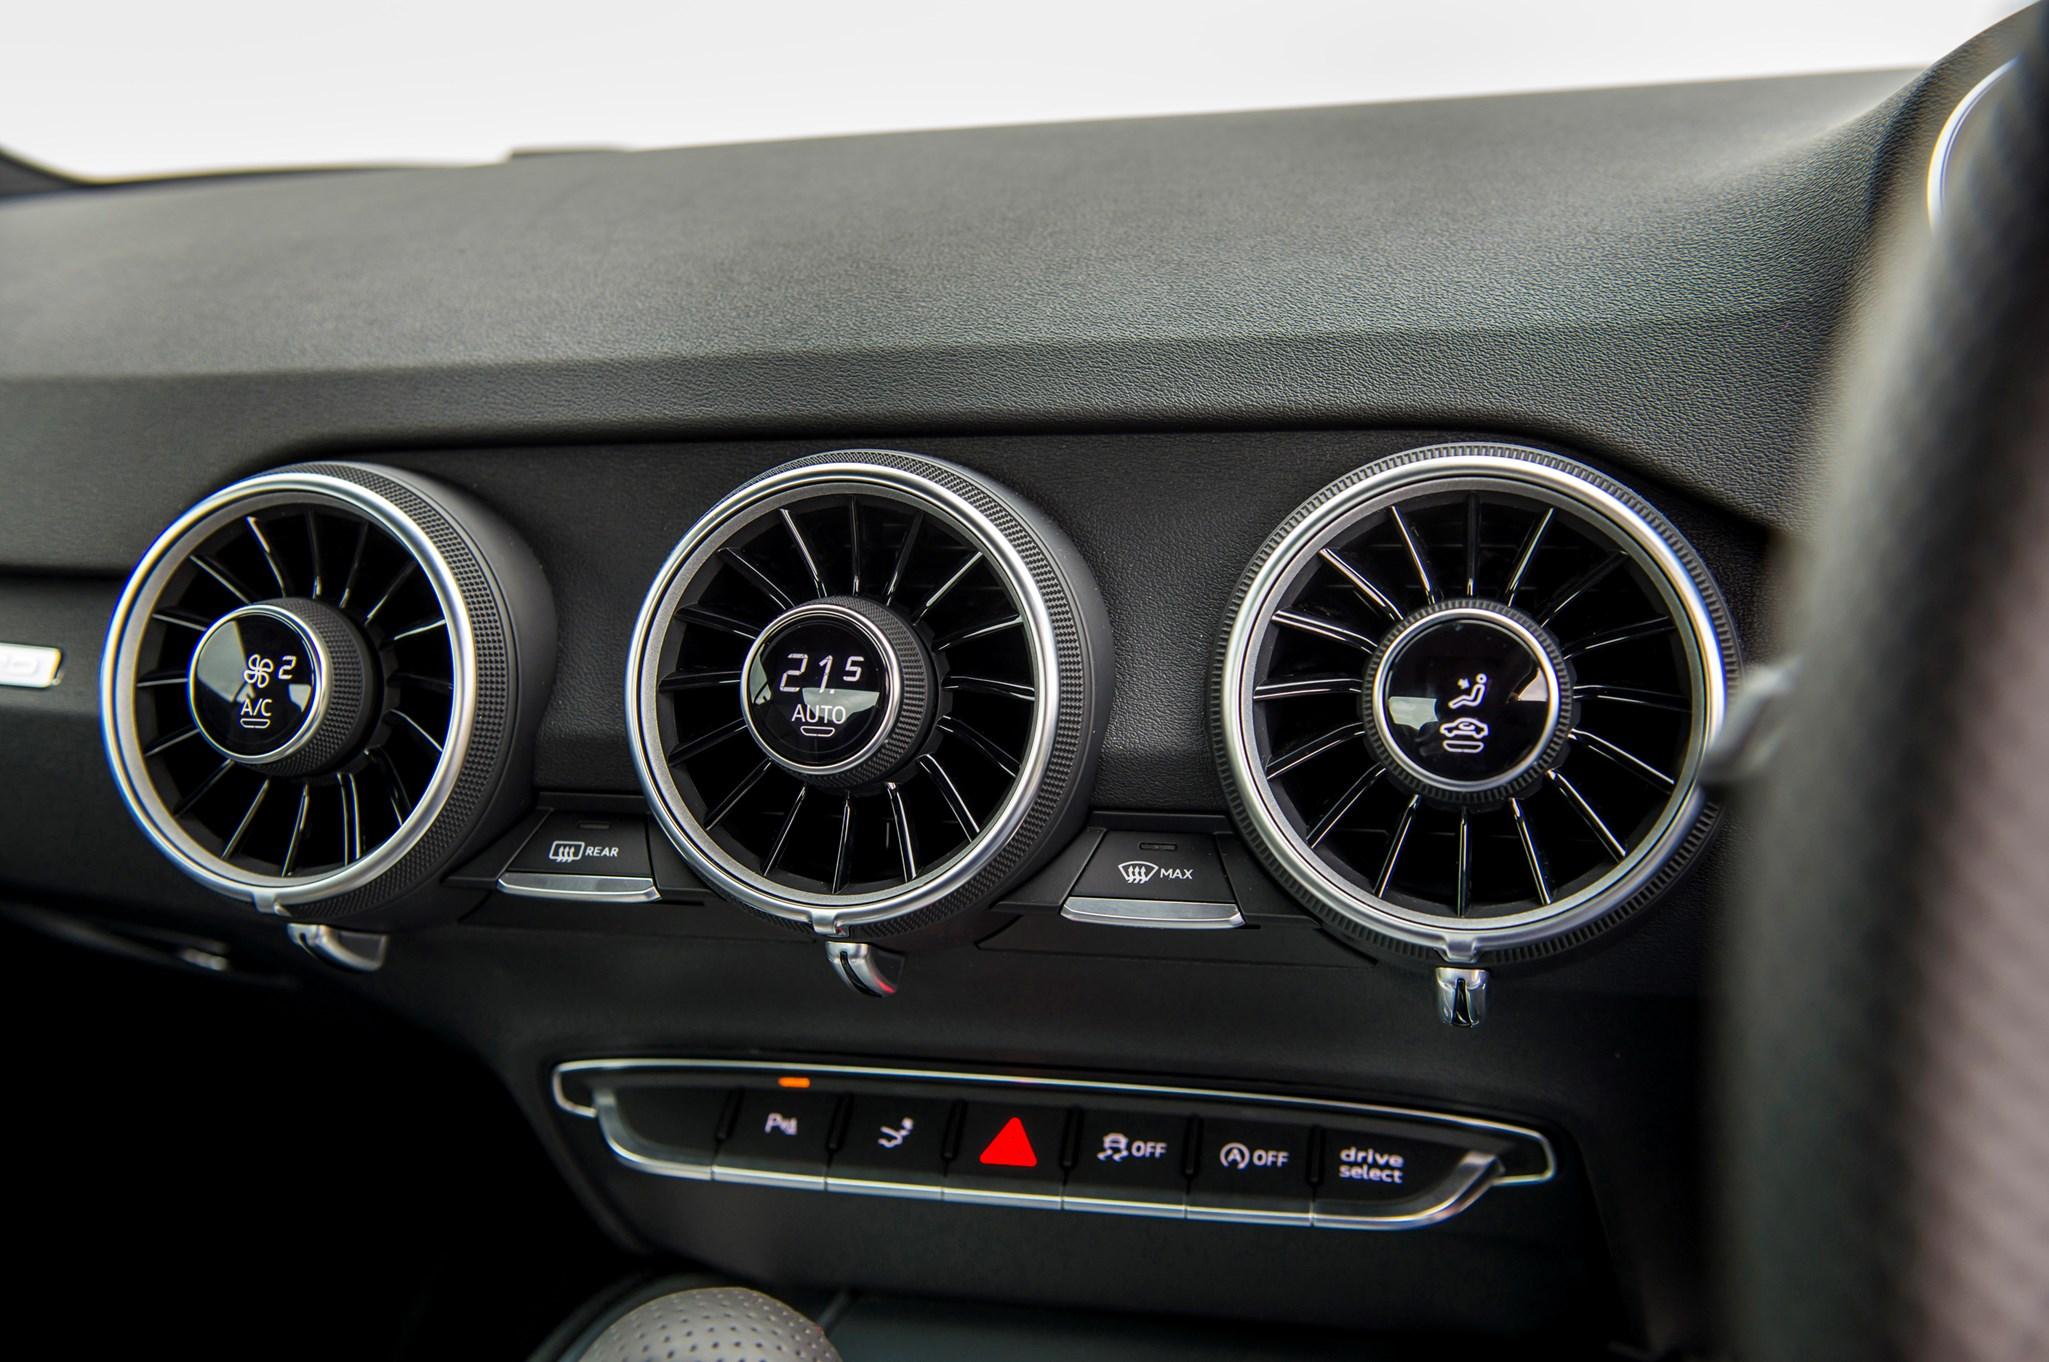 Audi Tt For Sale >> Audi TT 2.0 TFSI Quattro (2015) review | CAR Magazine